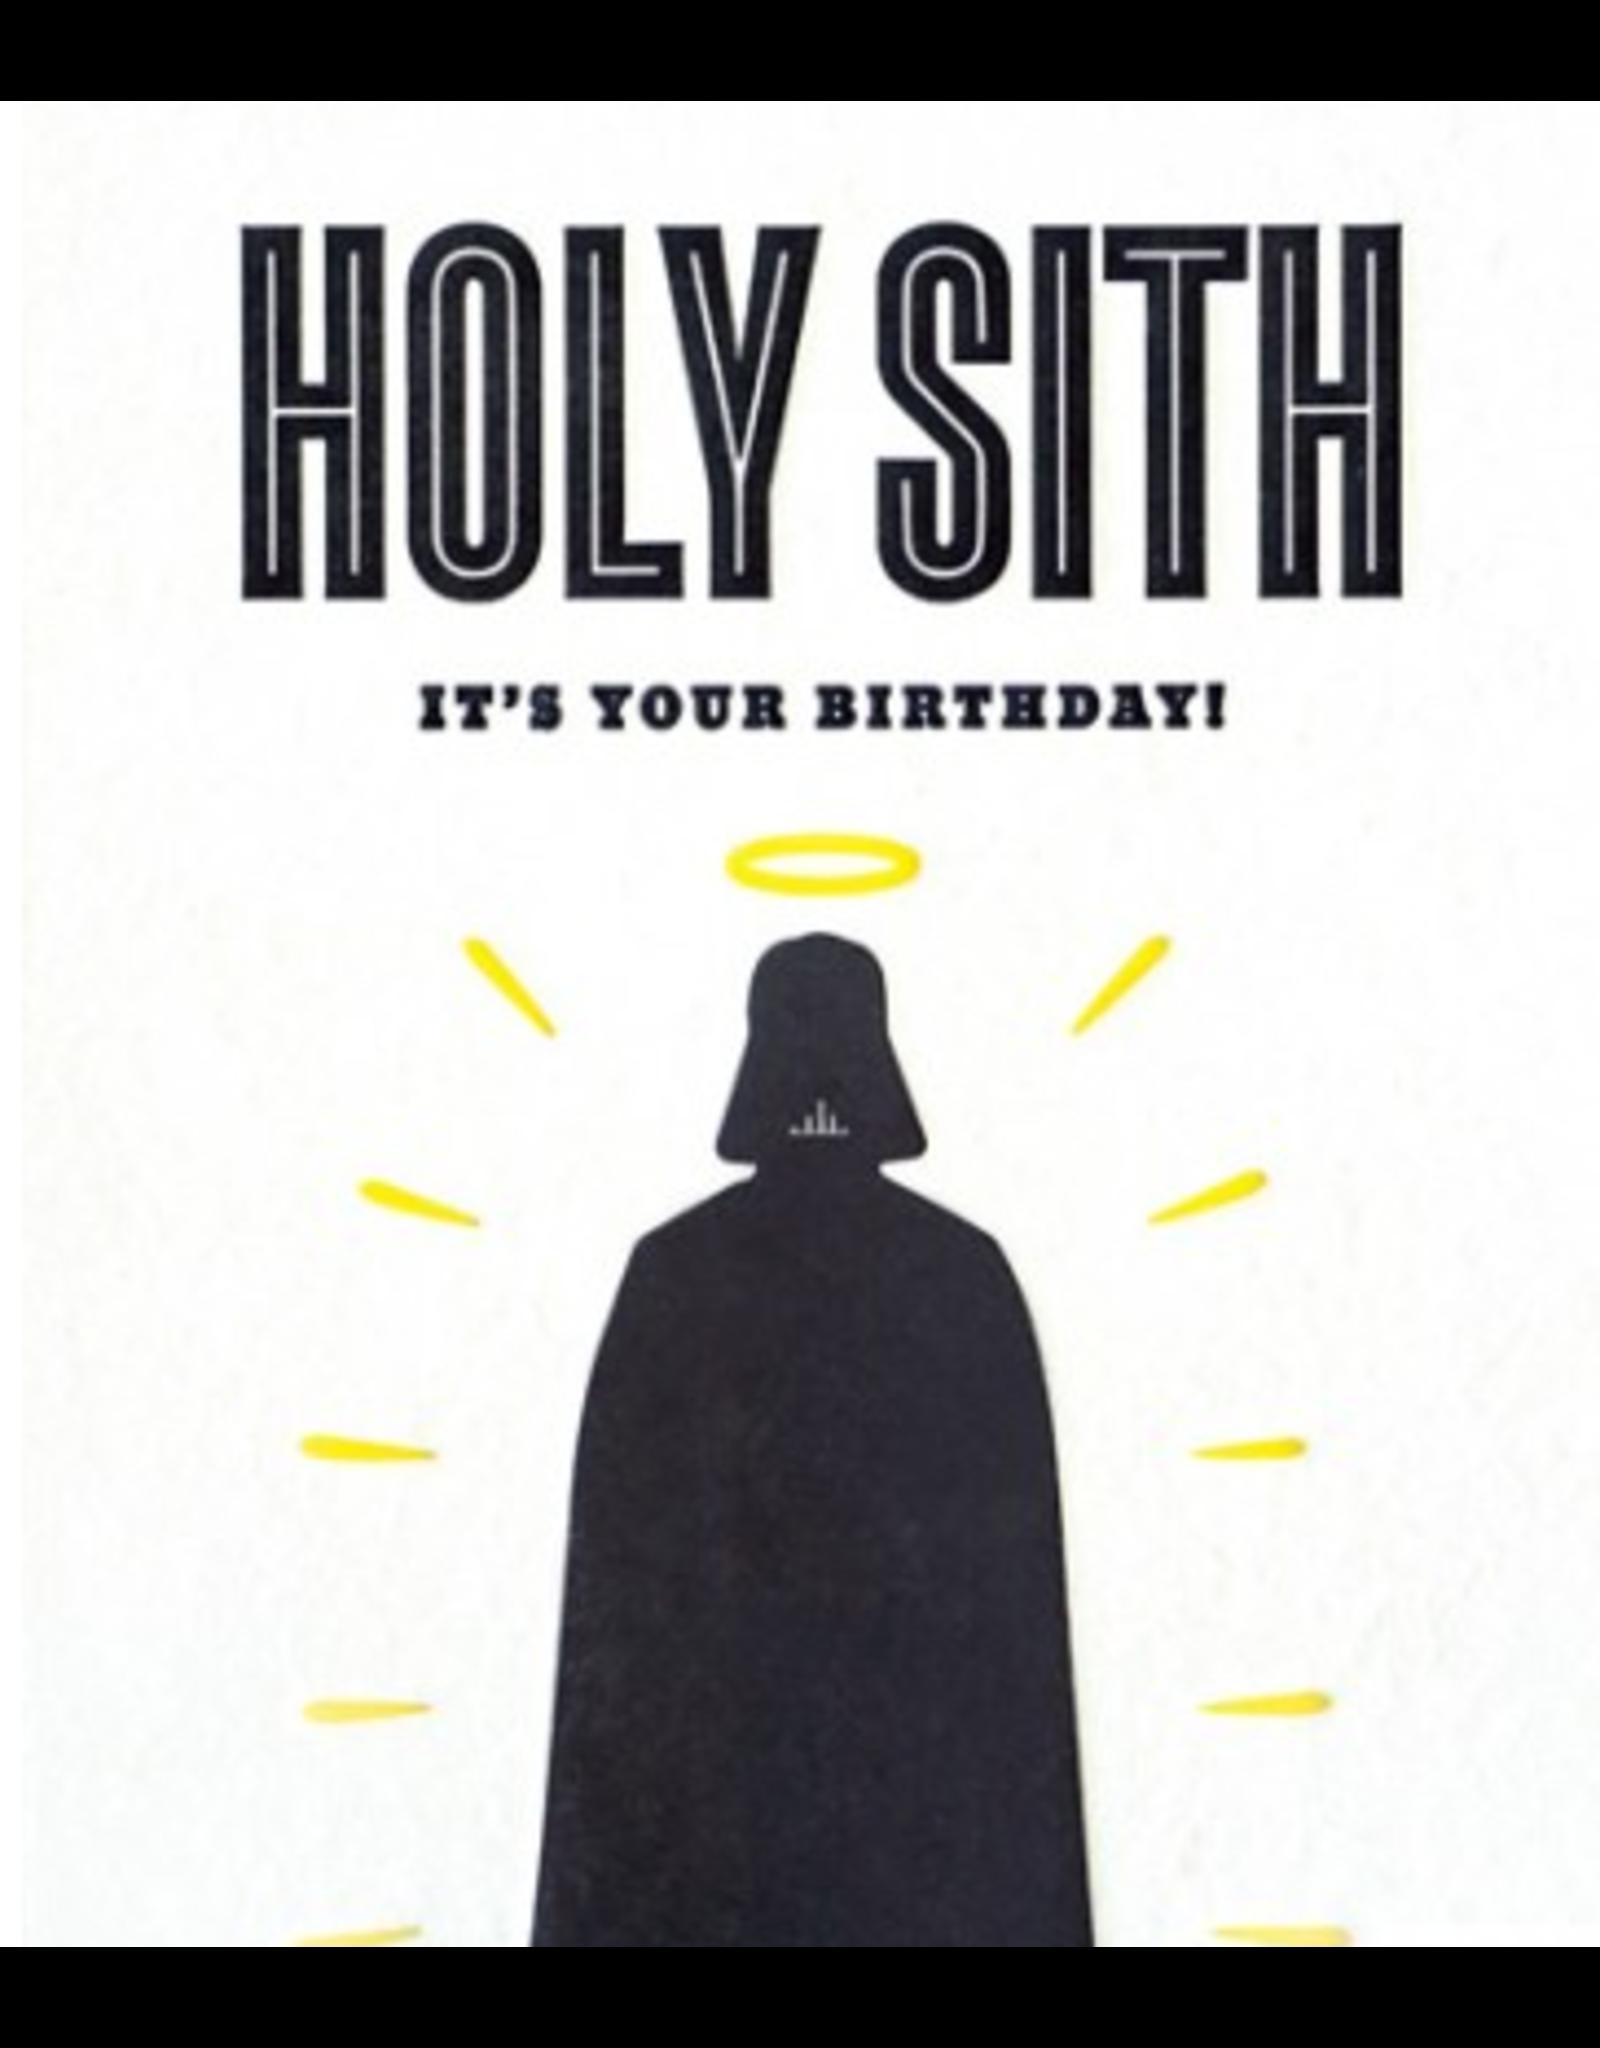 Holy Sith Birthday Greeting  Card